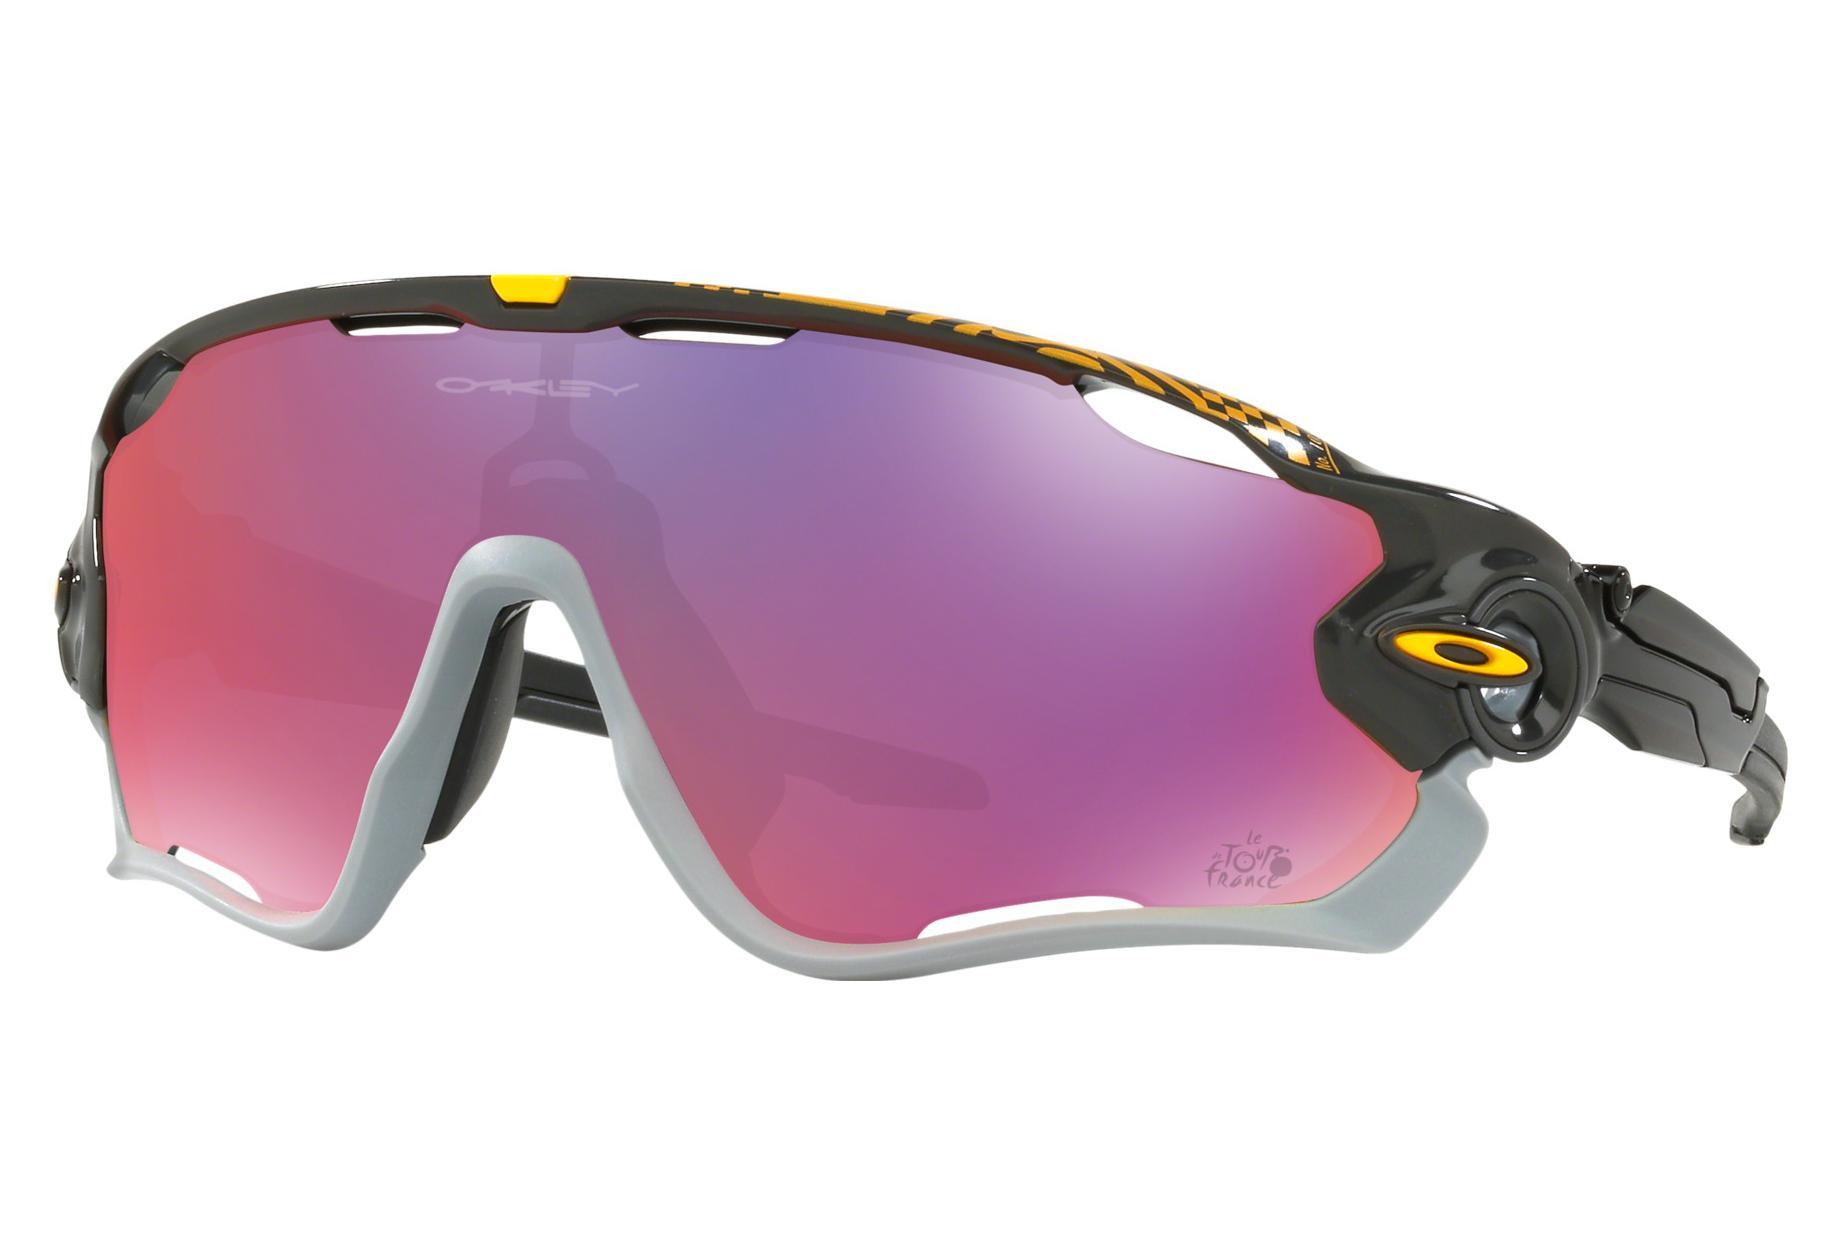 Oakley Sunglasses Jawbreaker Tour de France 2018 Edition Carbon Prizm Road  Ref OO9290-3531   Alltricks.com 9031a8f28f95